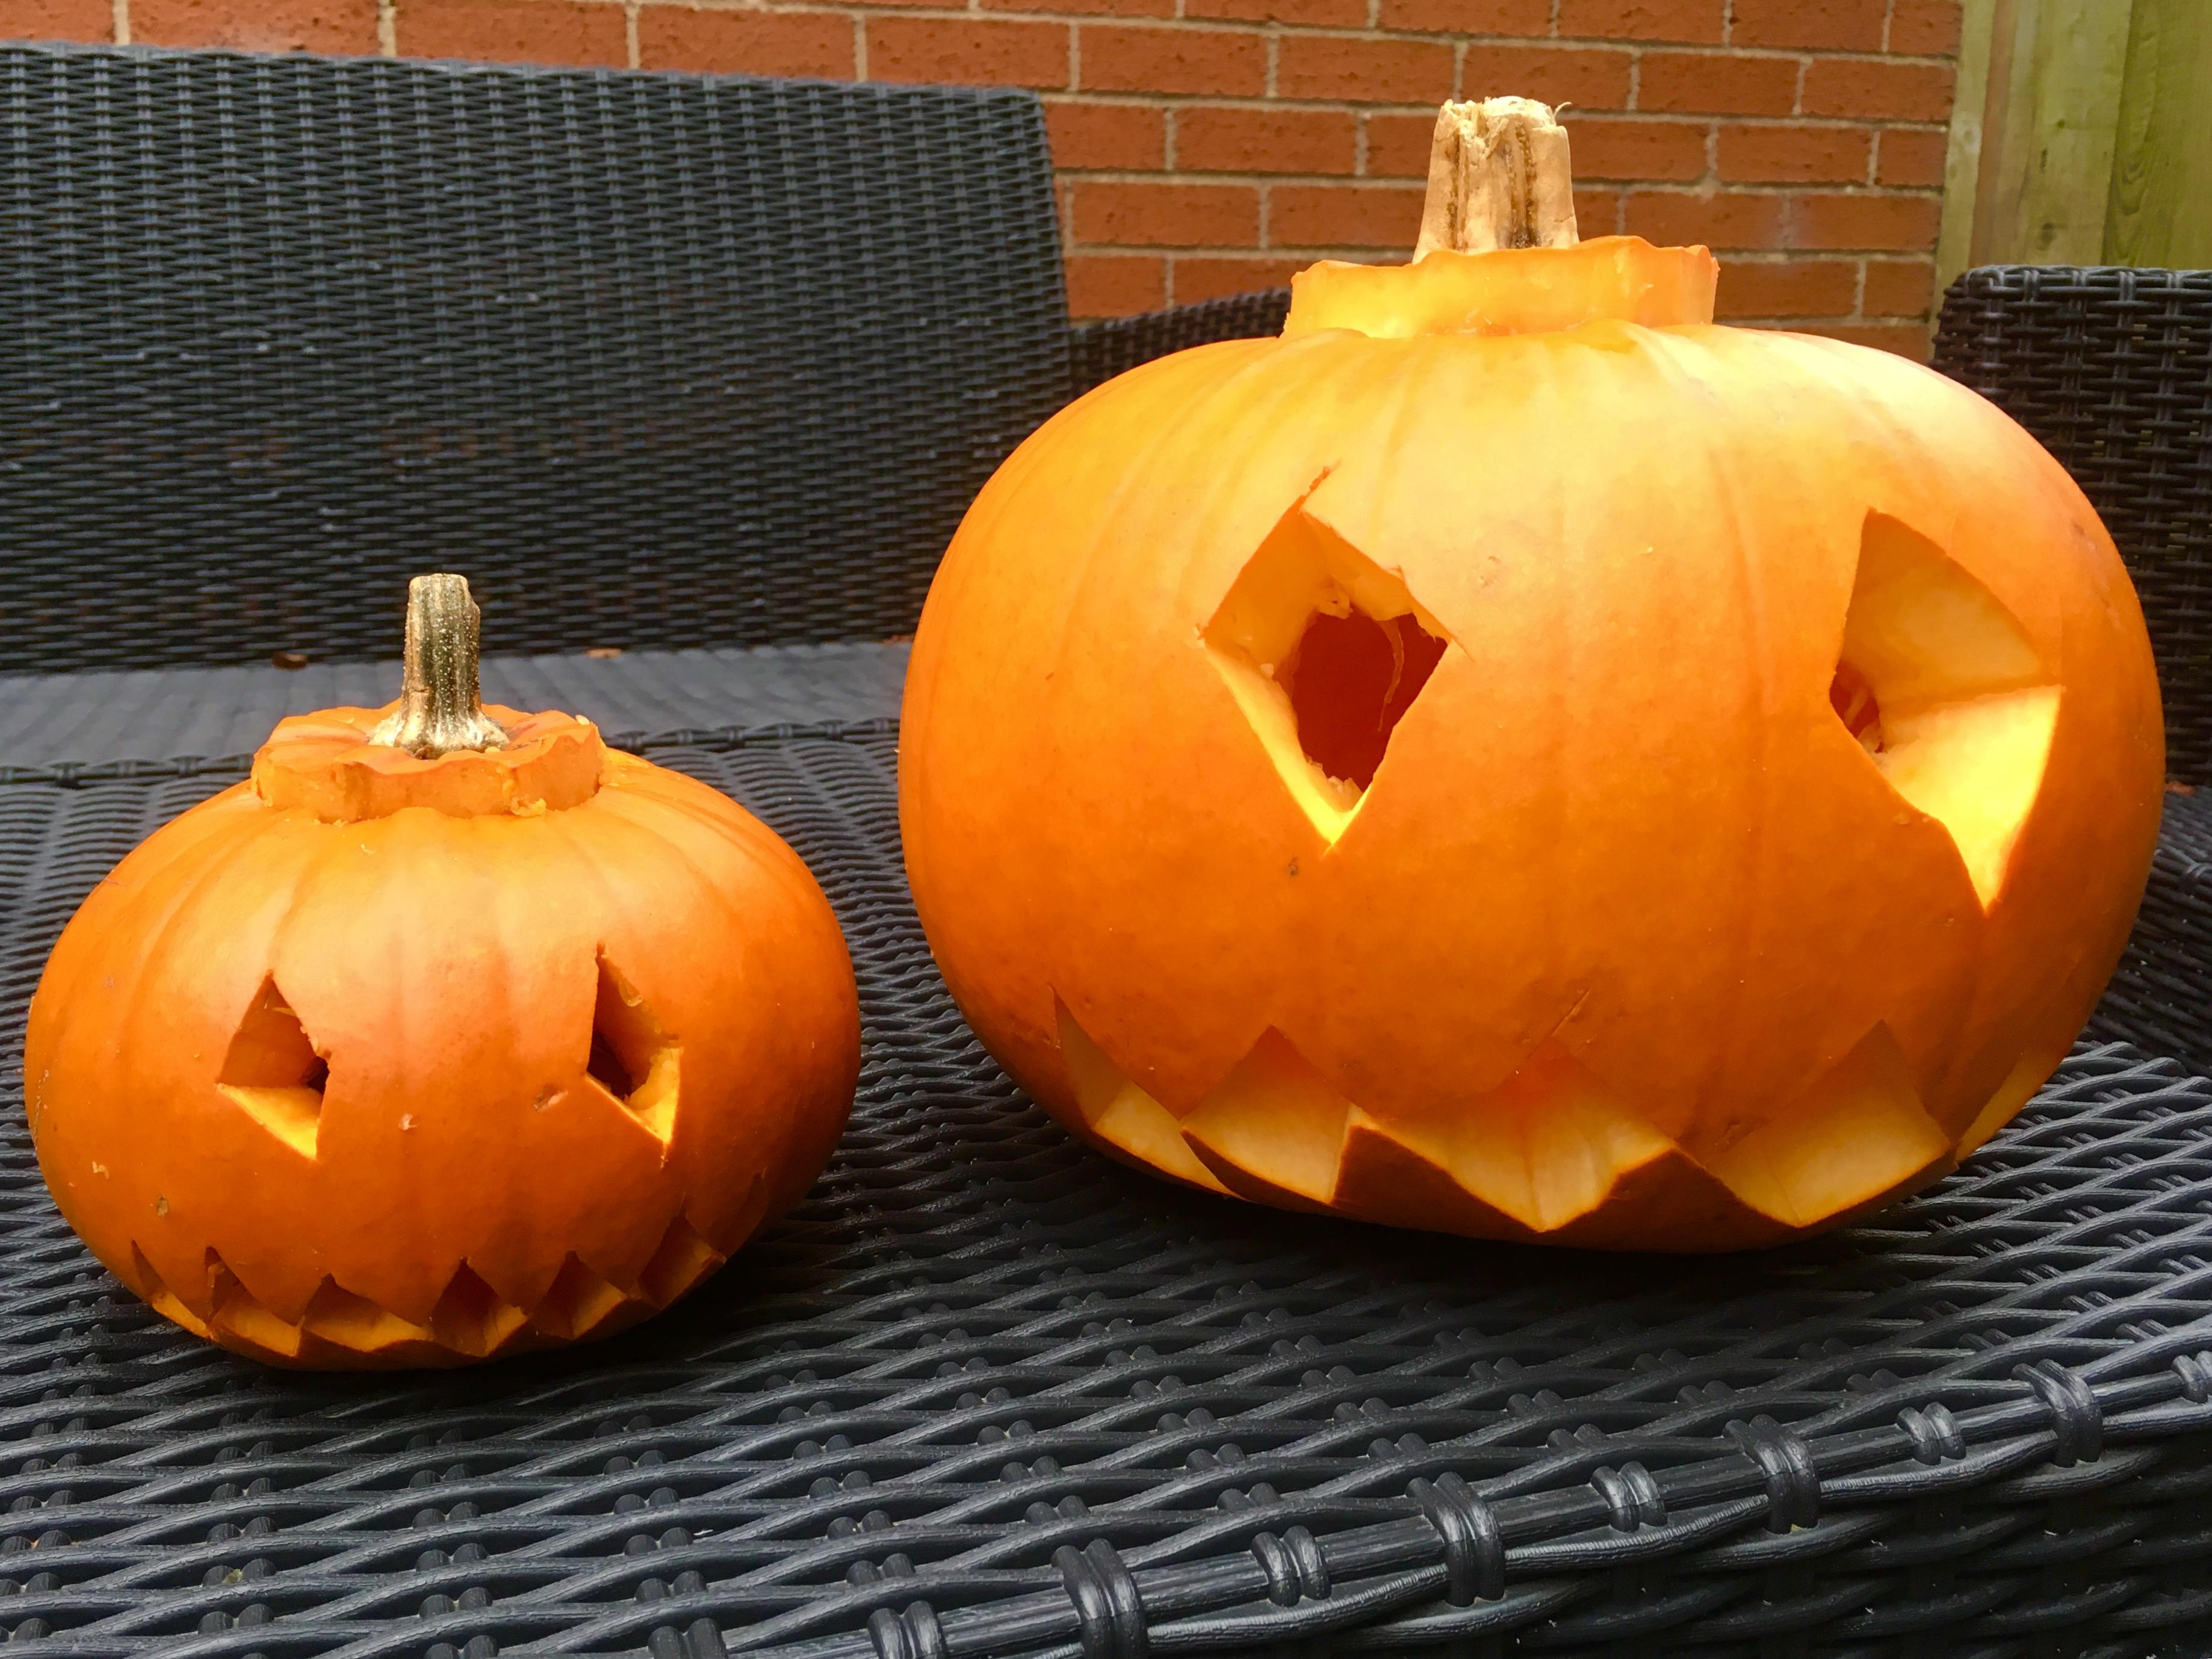 Pumpkin Carving Zorbing And Shingles Williams World Blog